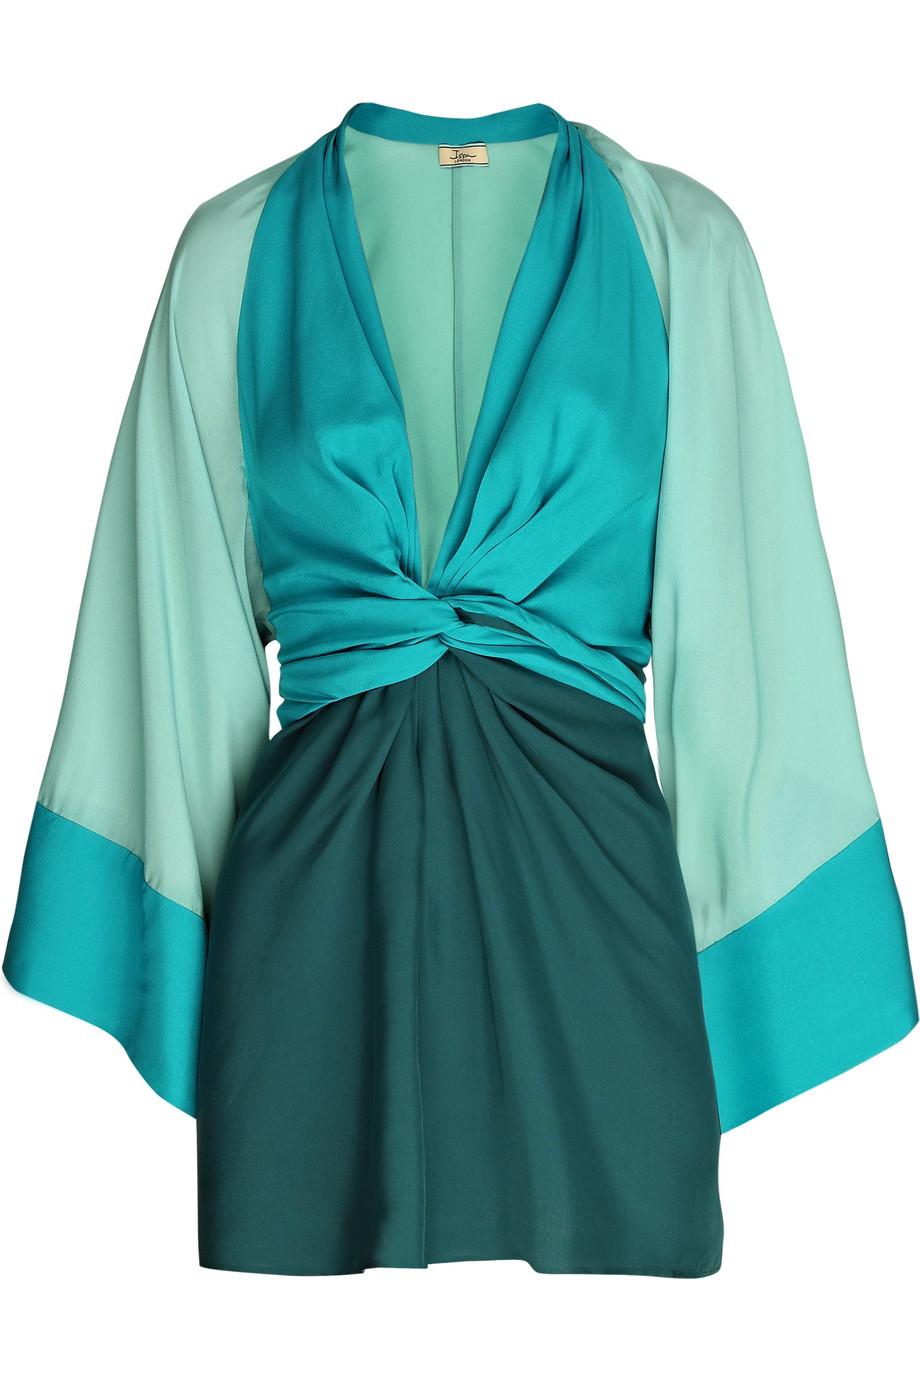 02-11 Issa Kimono Dress (1)